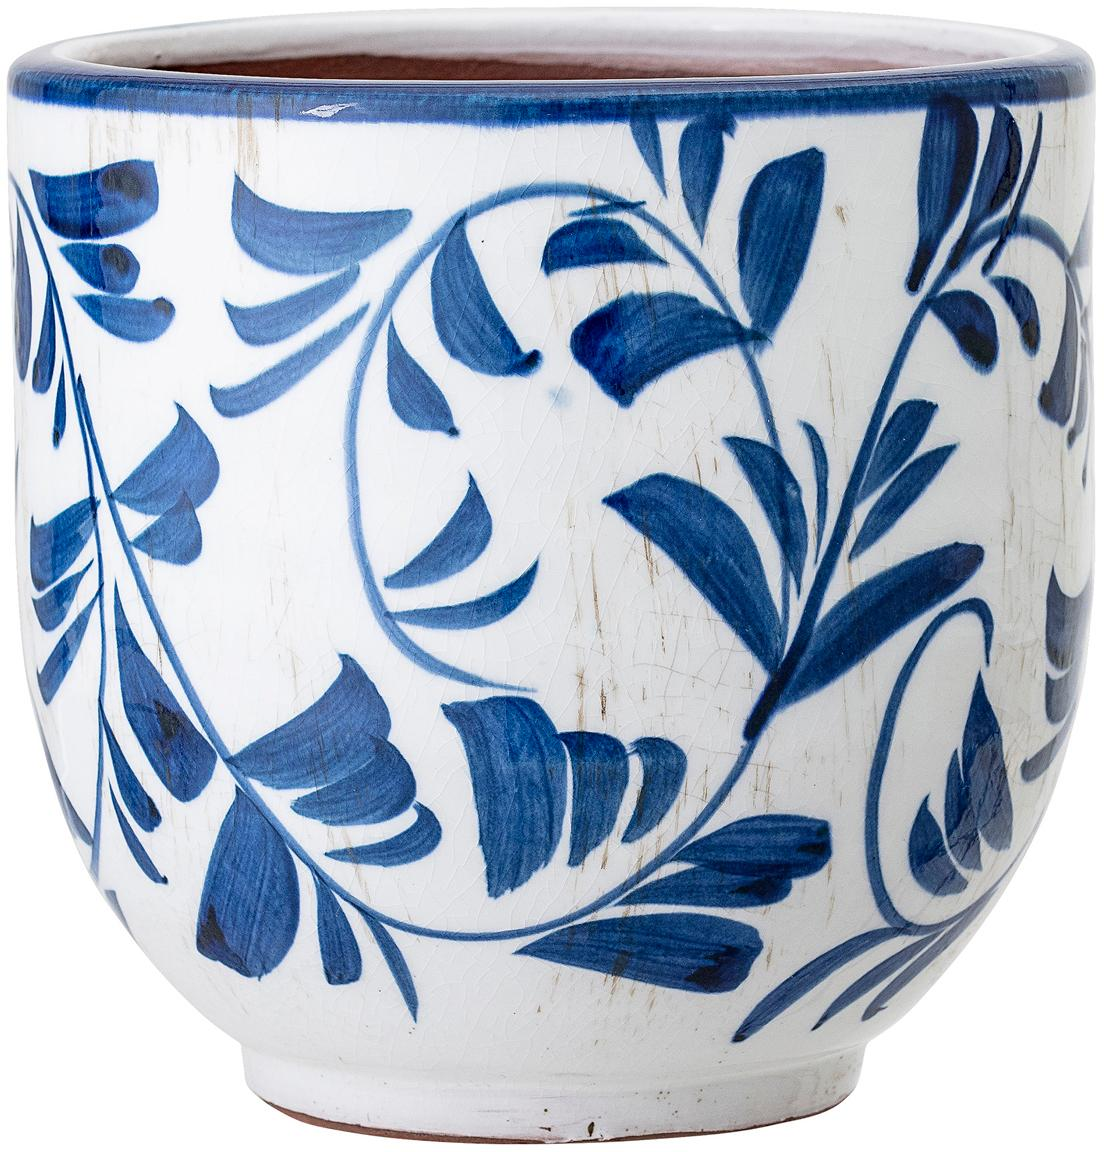 Portavaso in terracotta Jarl, Terracotta, Blu, bianco, Ø 14 x Alt. 14 cm